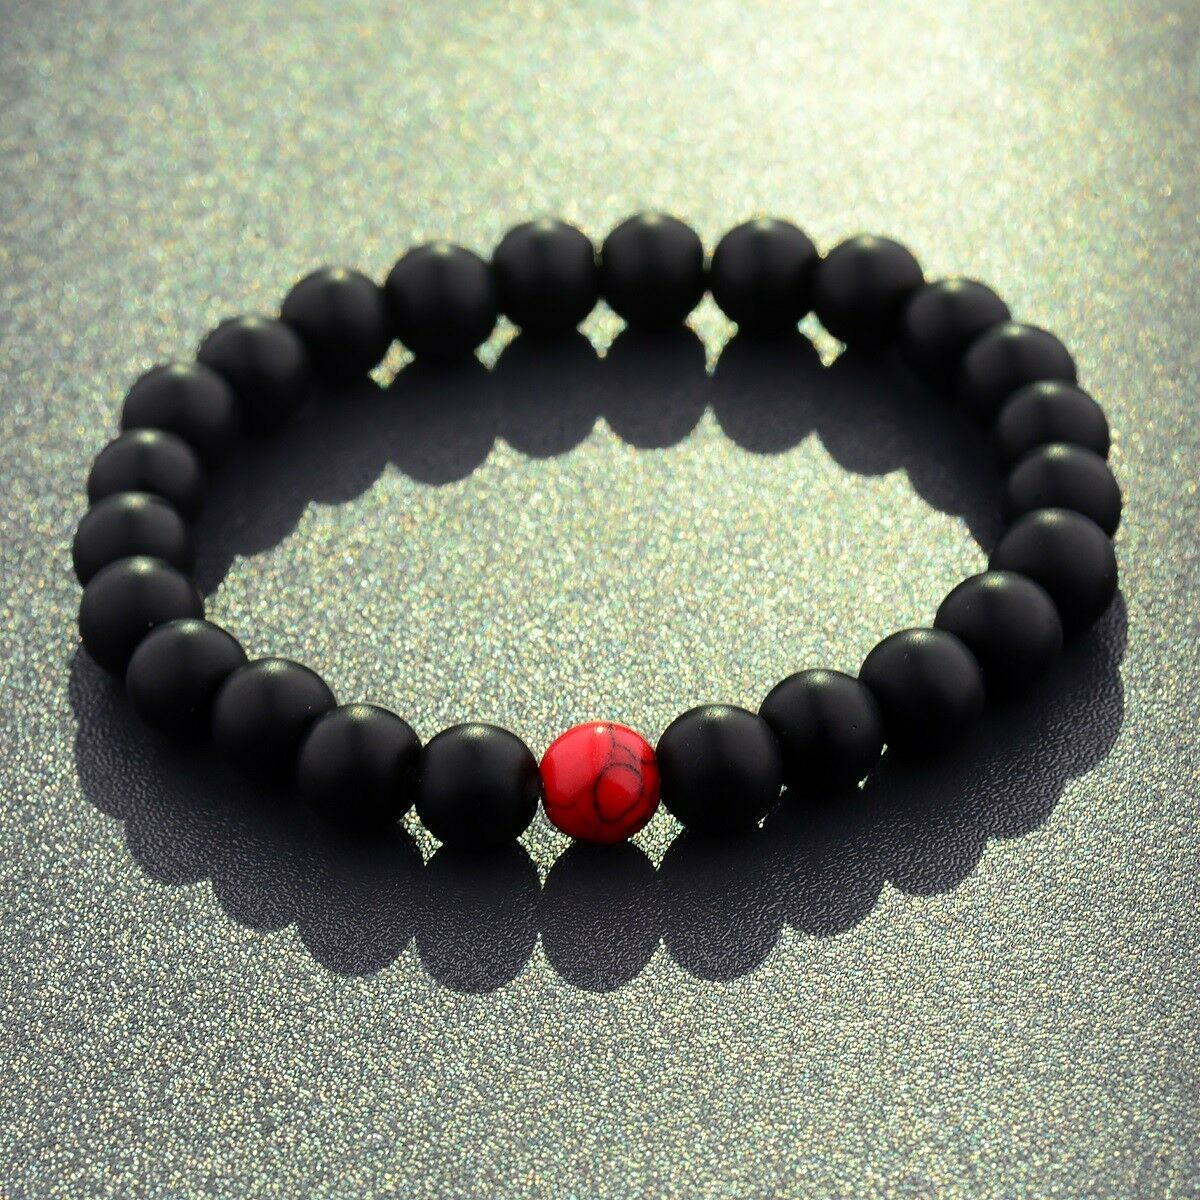 8MM Matte Beads Unisex Lovers Couples Matching Gifts Promise Bracelets Men Women